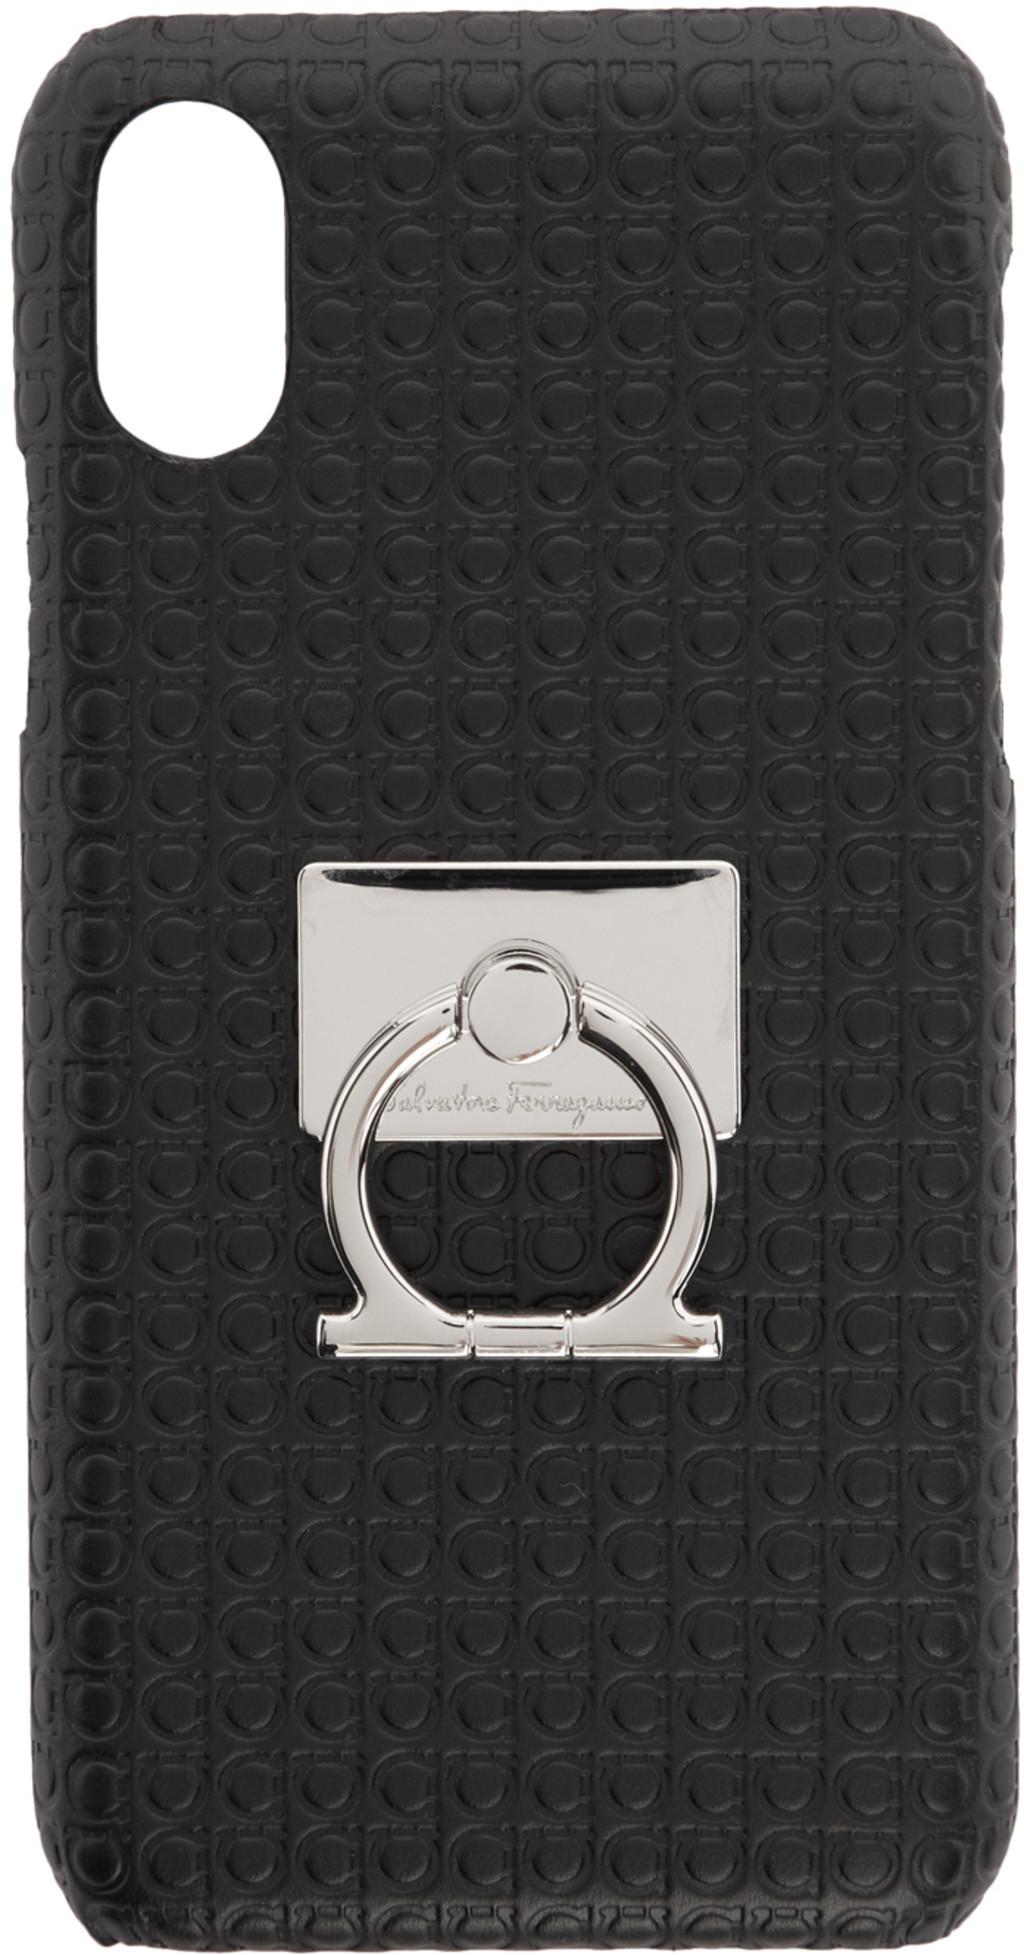 buy online 3267c f3e9b Black Mini Gianco iPhone X Case